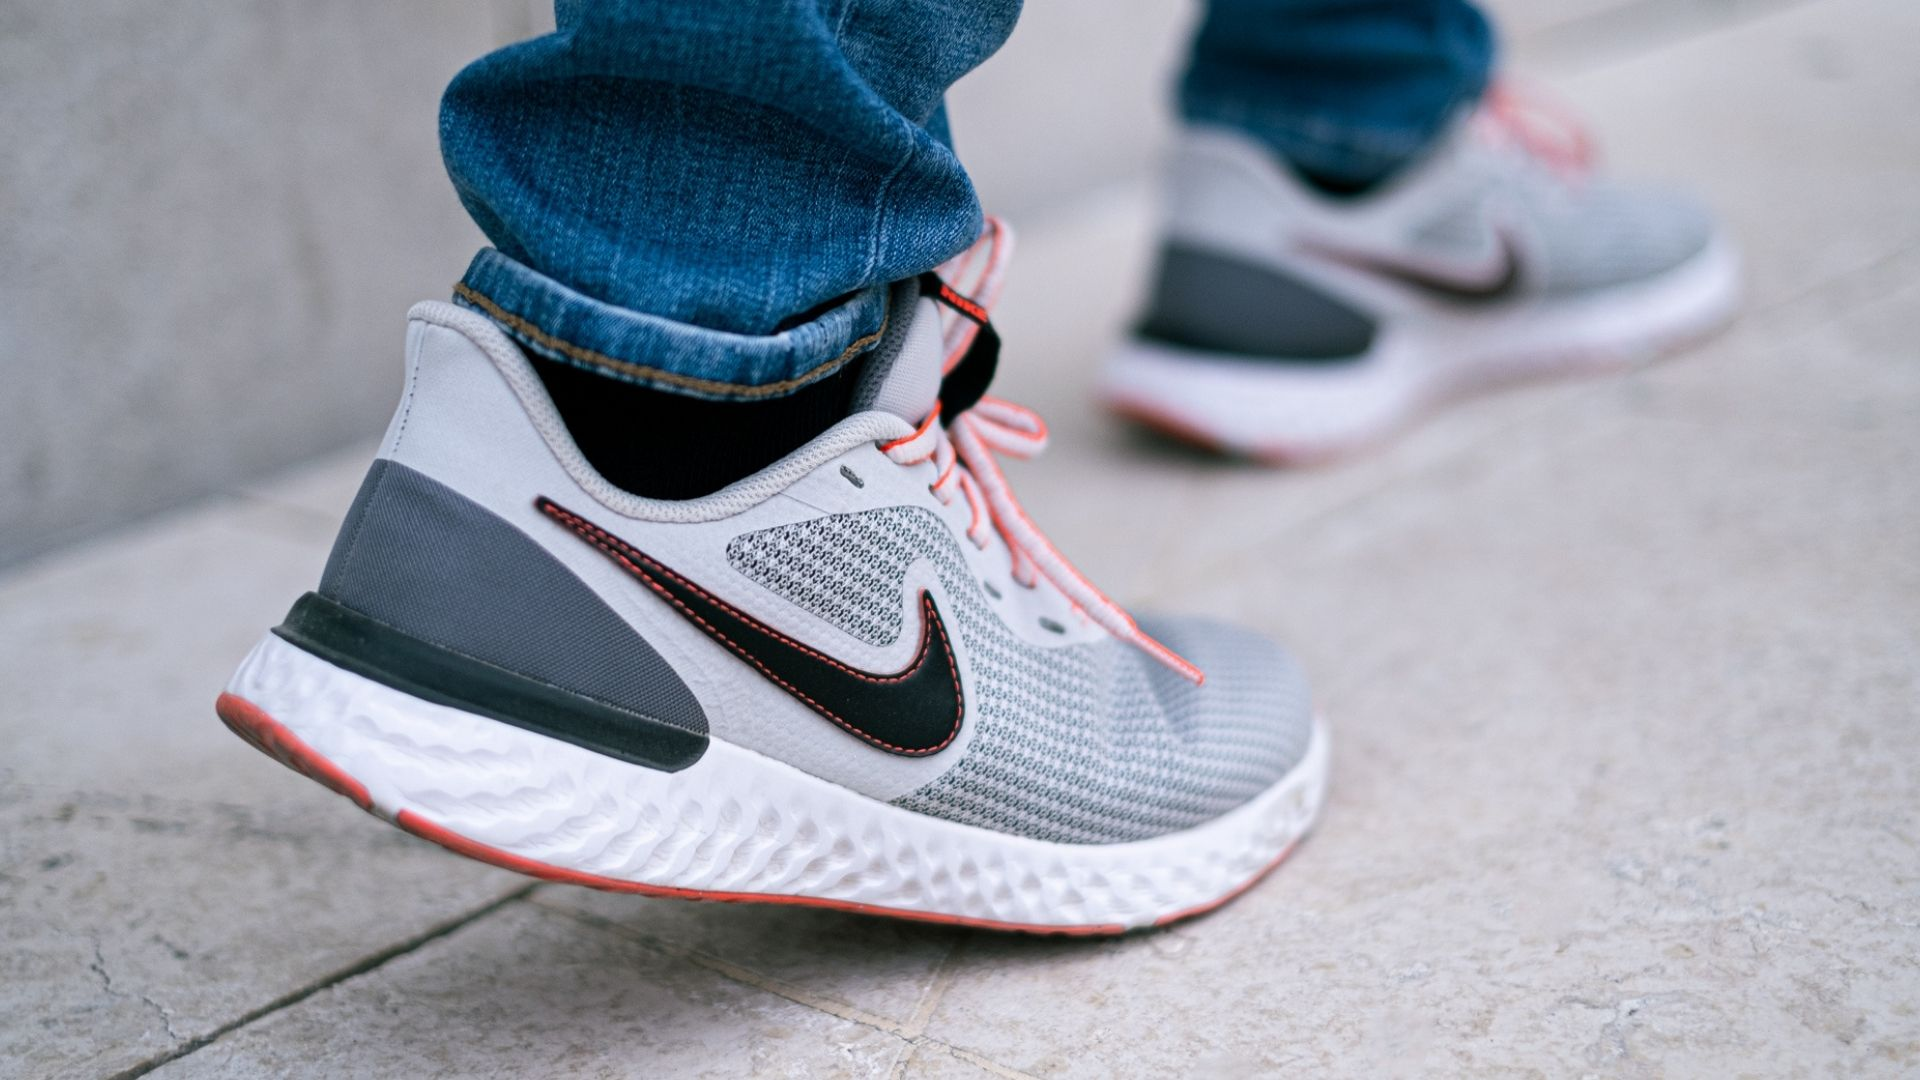 2 Nike Revolution 5 Test - Erfahrung